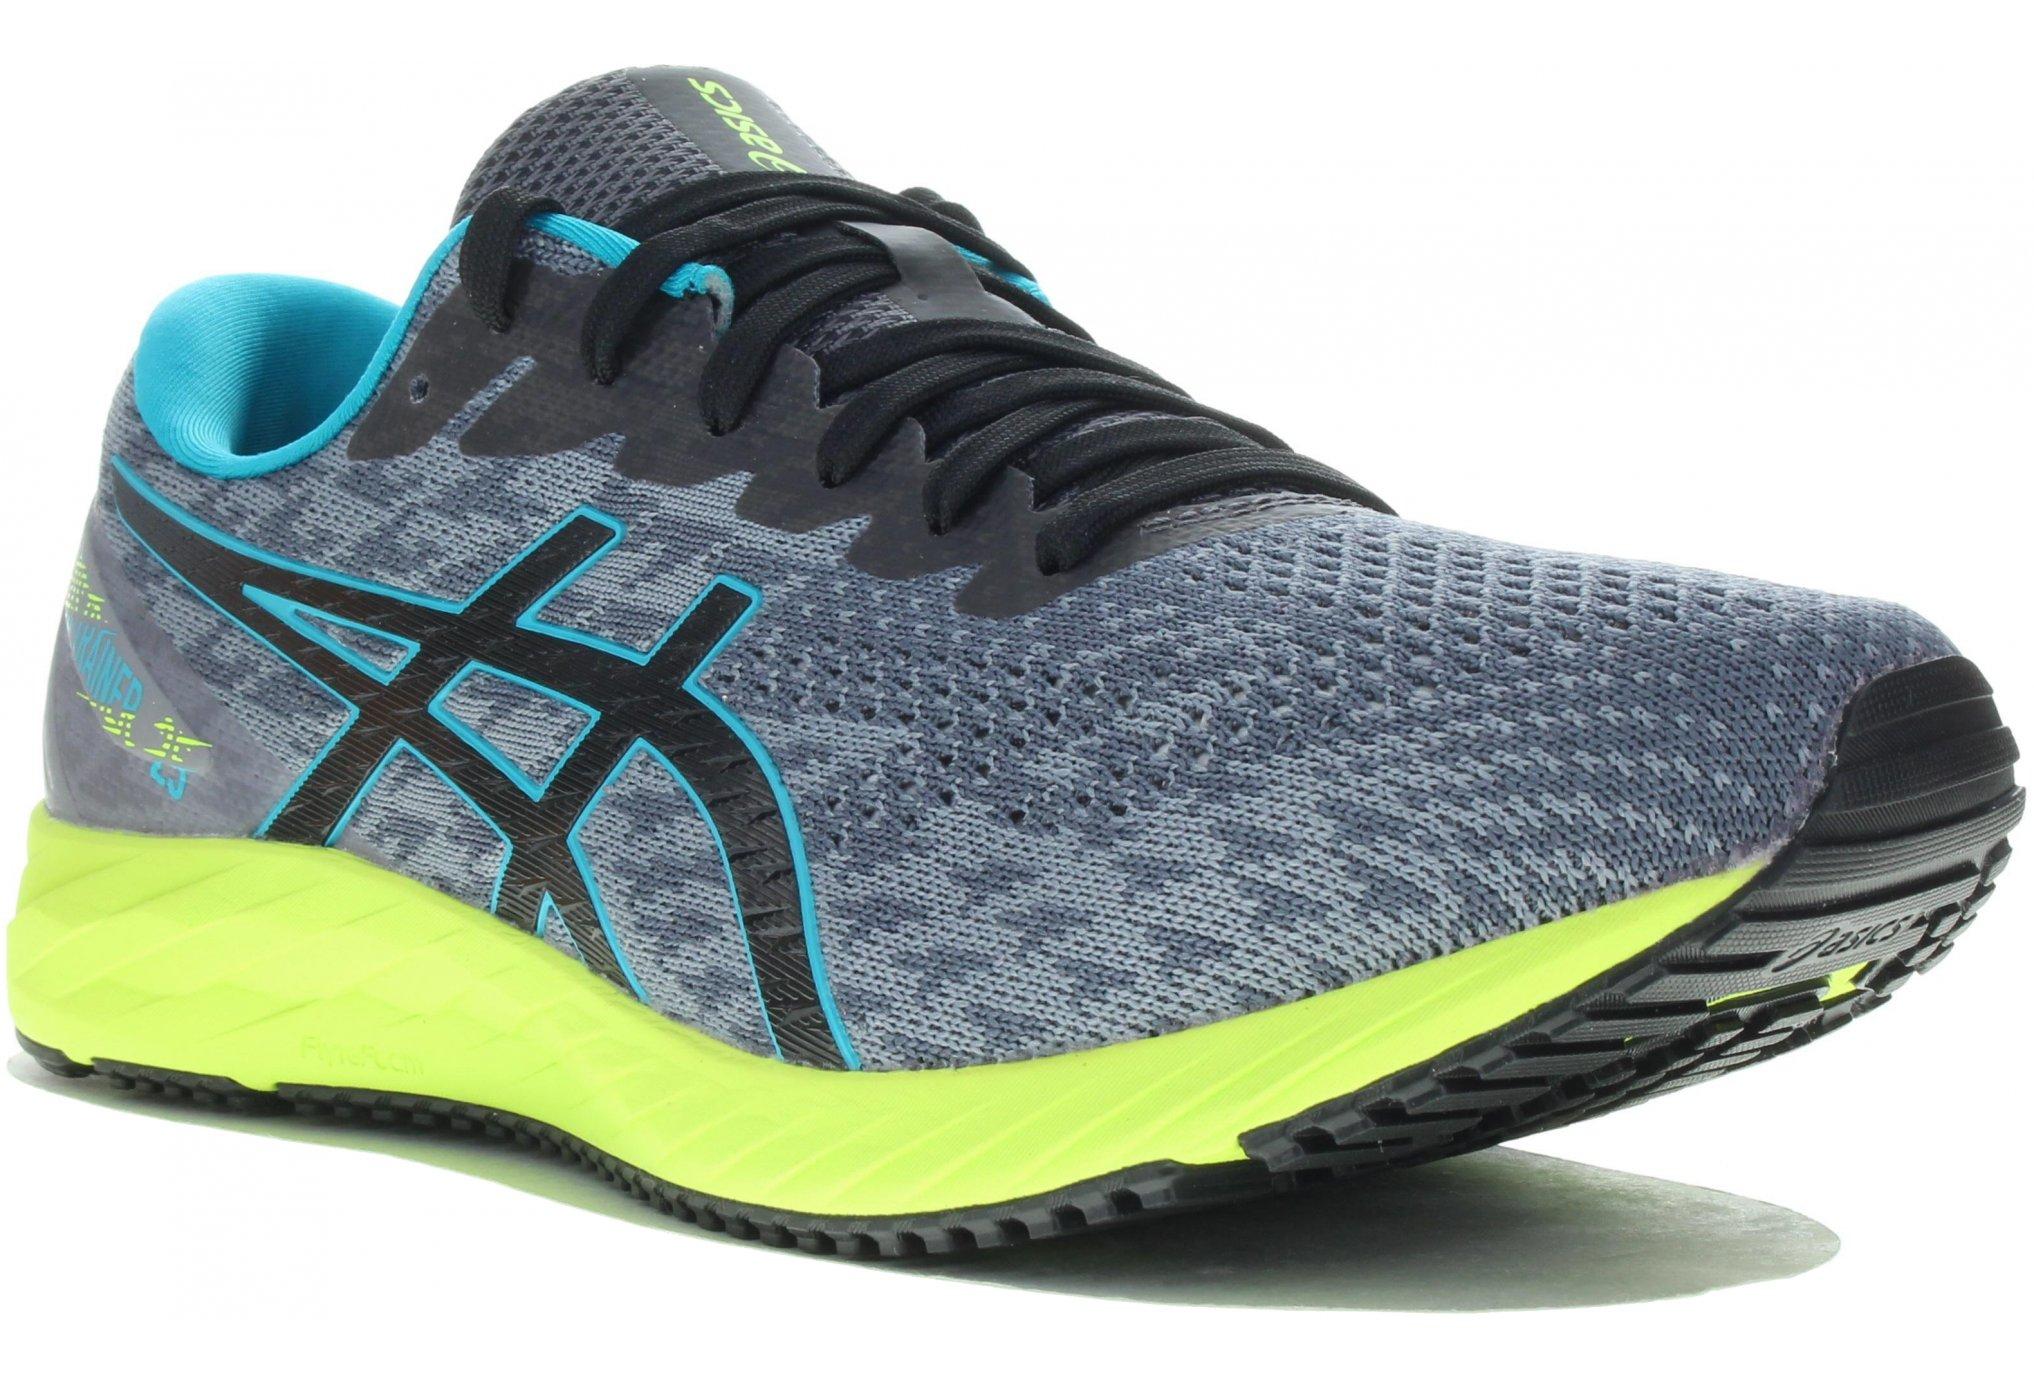 Chaussures de running Asics Gel-DS Trainer 25 M - gris/vert (du 46 au 49)